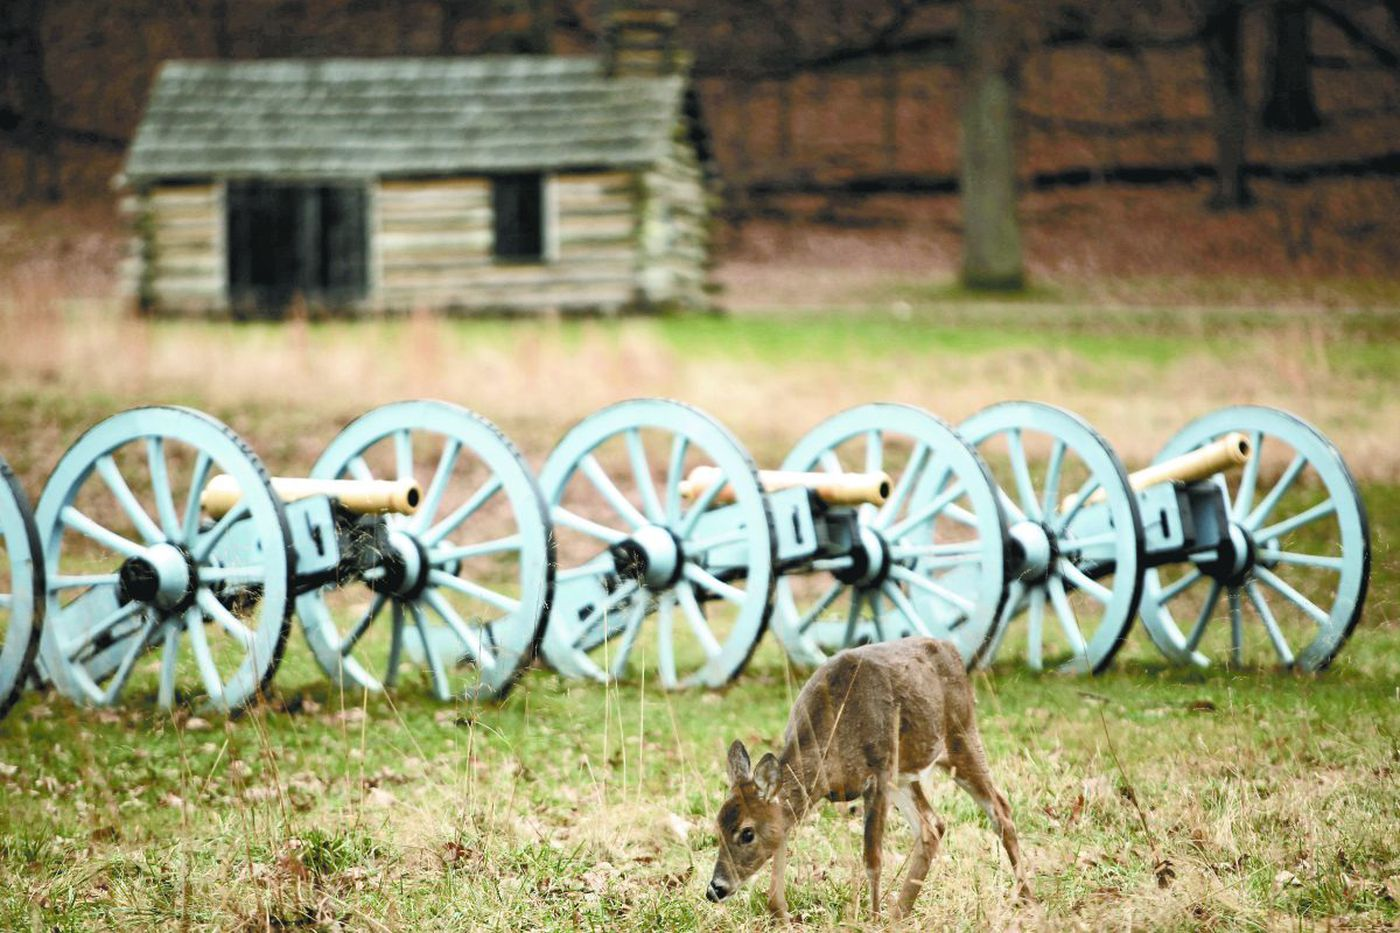 Philadelphia region saw record 42 million visitors in 2016